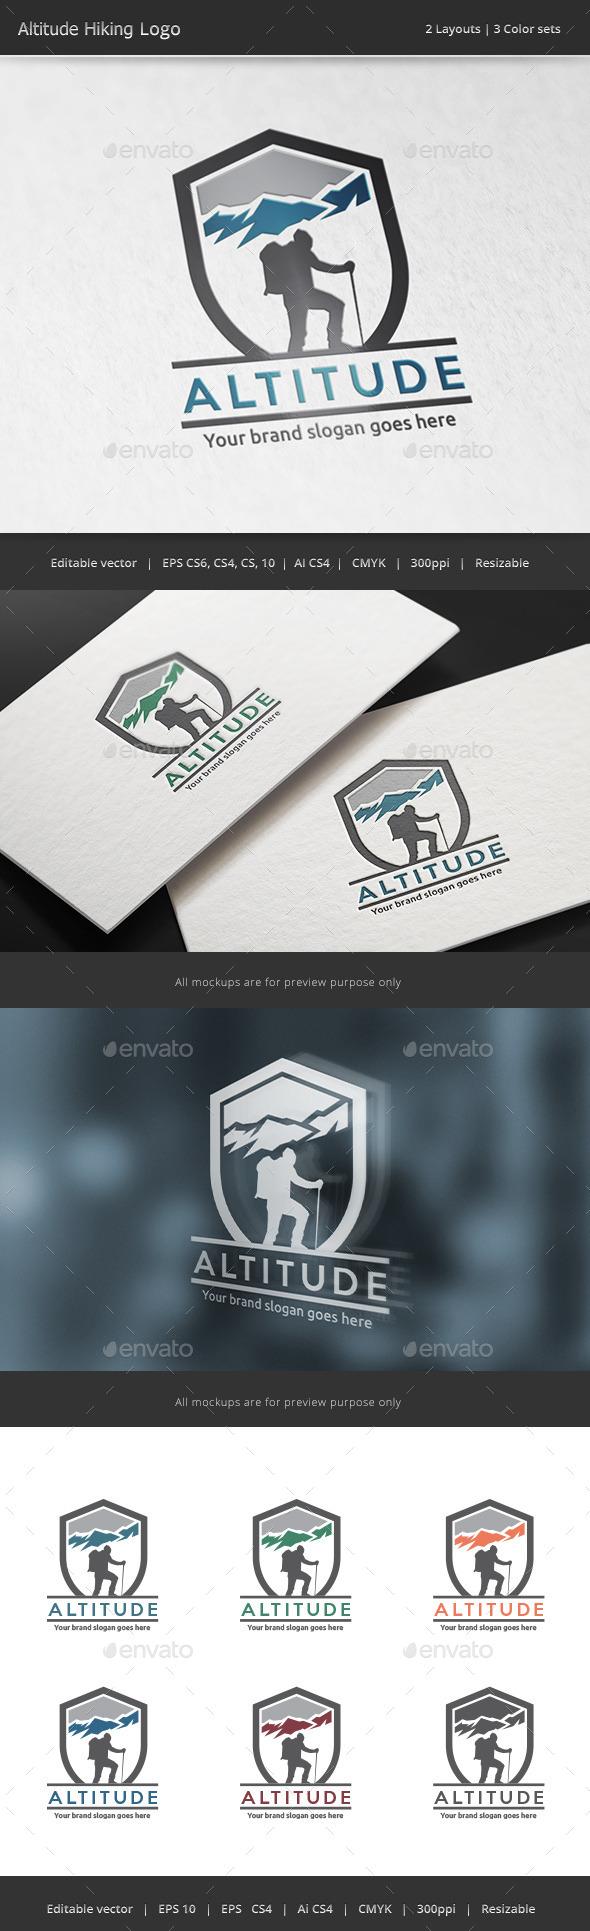 Altitude Trekking Logo - Nature Logo Templates